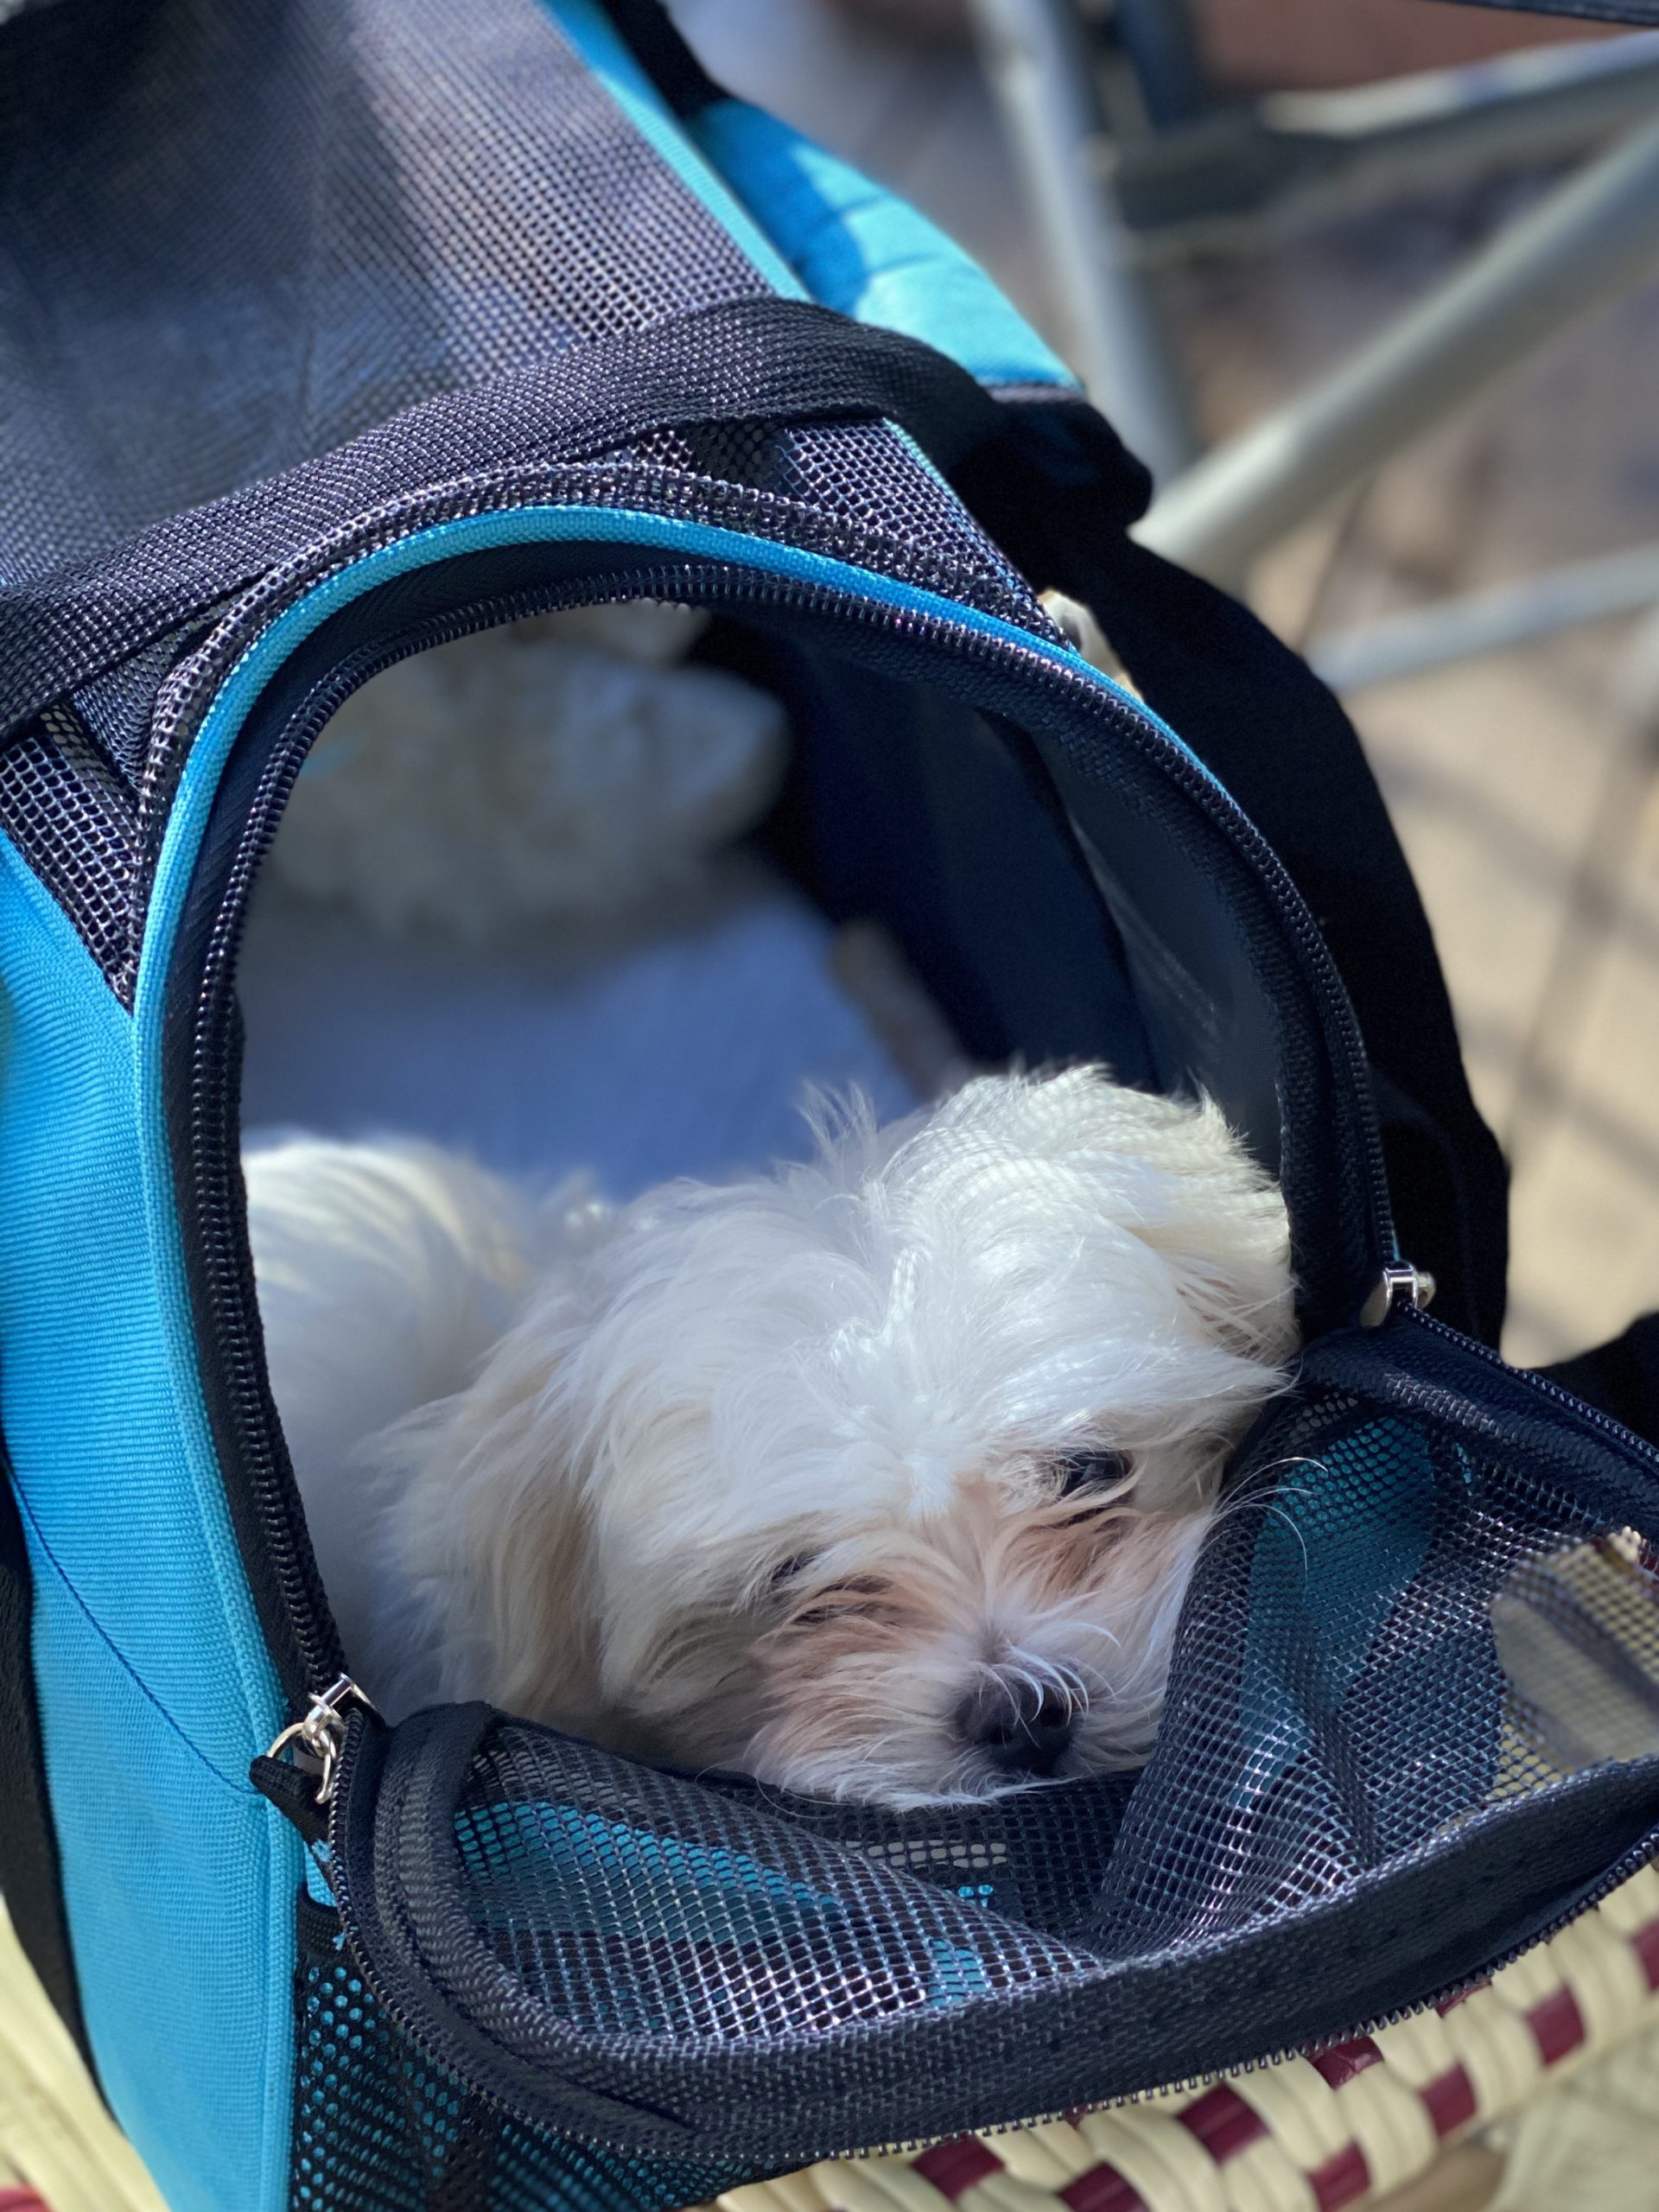 Maltese Puppy In Carrier